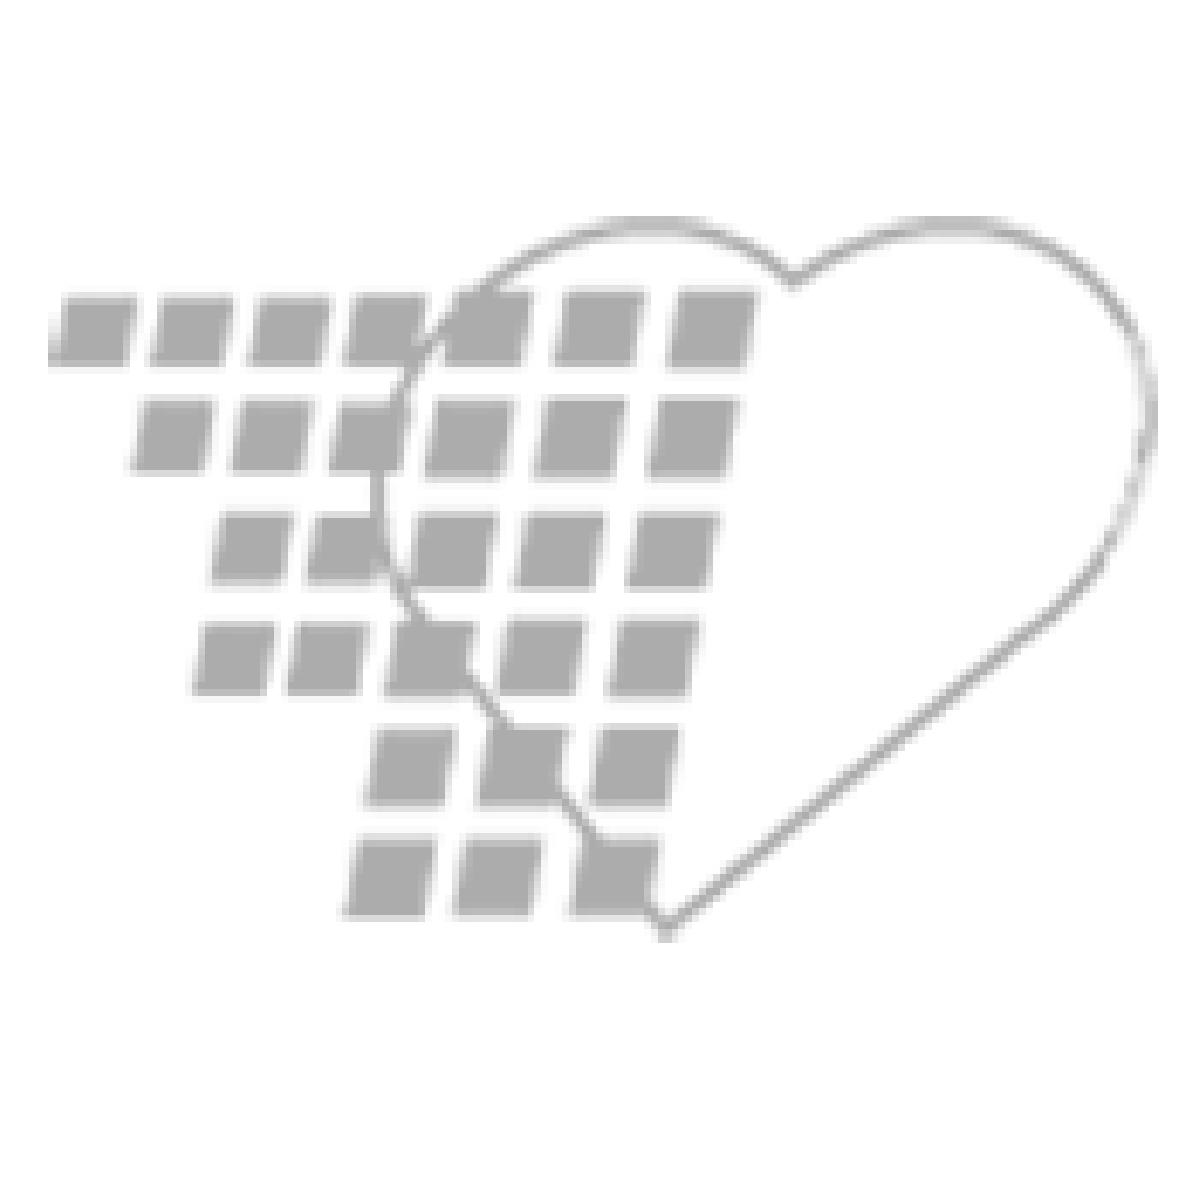 02-24-2136 - Welch Allyn  Wall Mount for Suretemp Plus